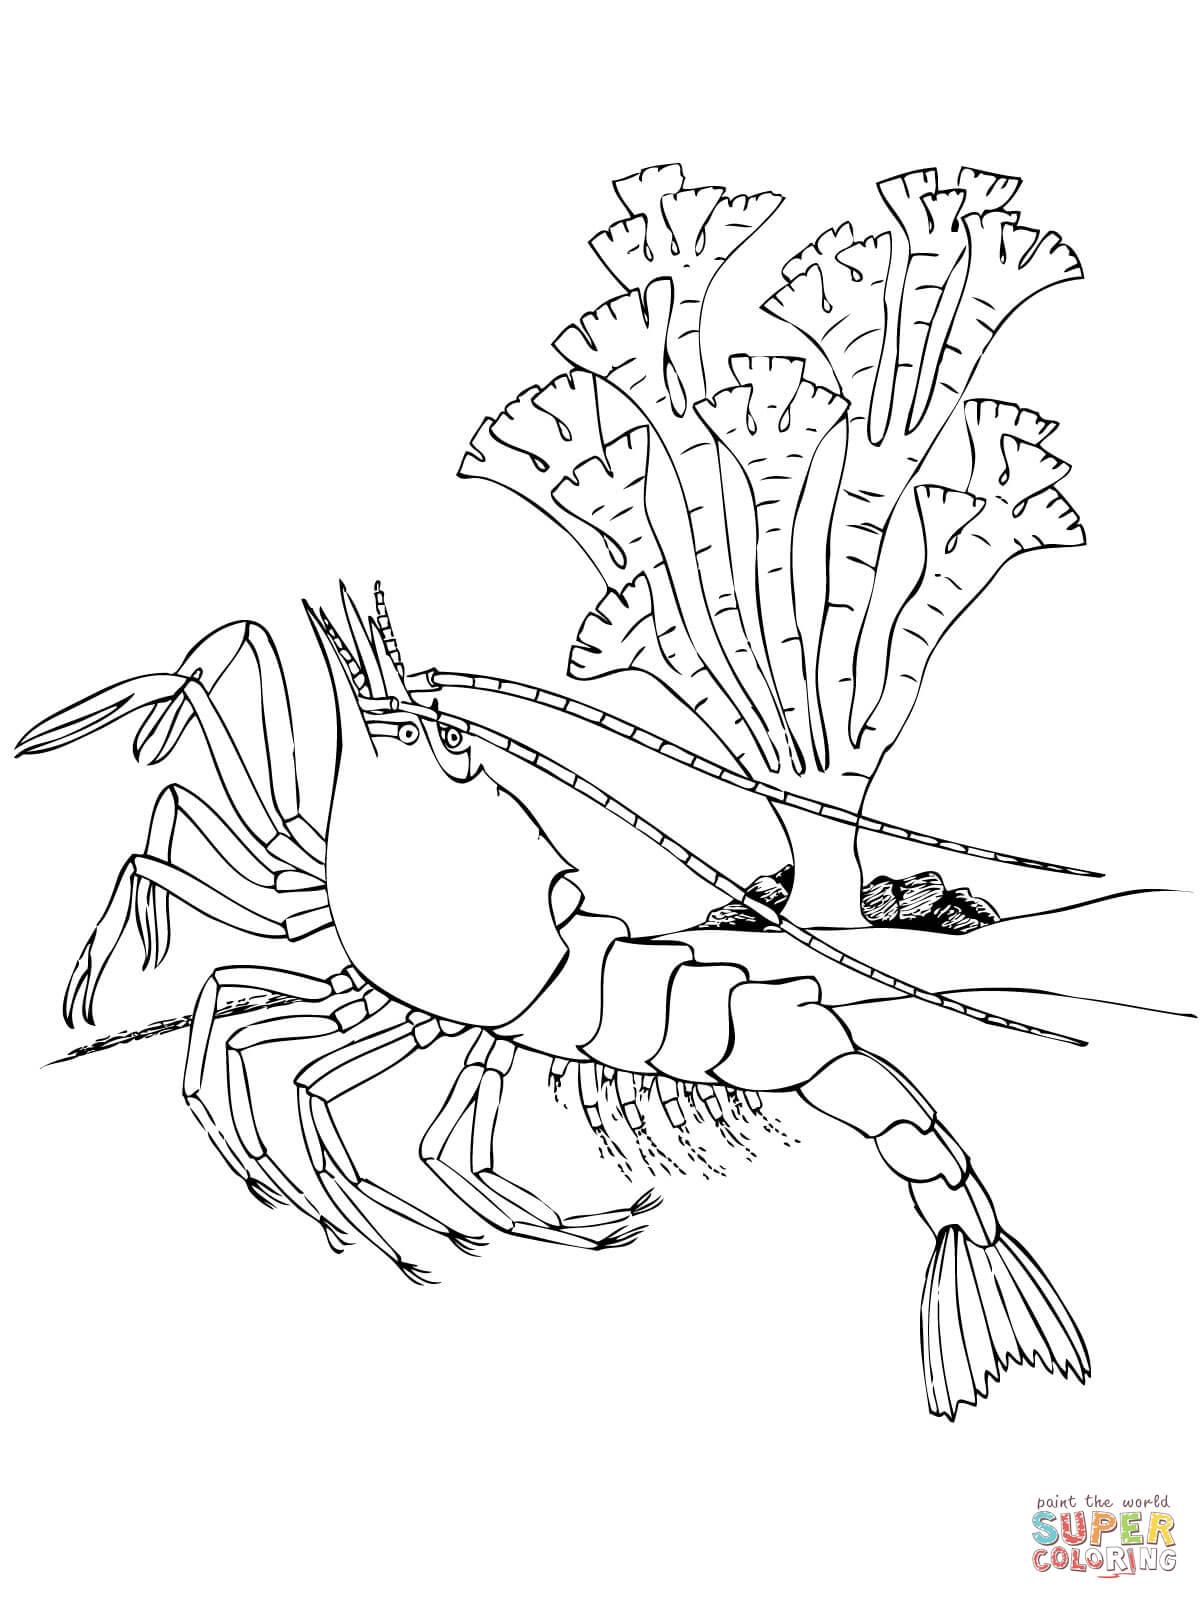 Shrimp Decapod Crustacean Coloring Page Free Printable